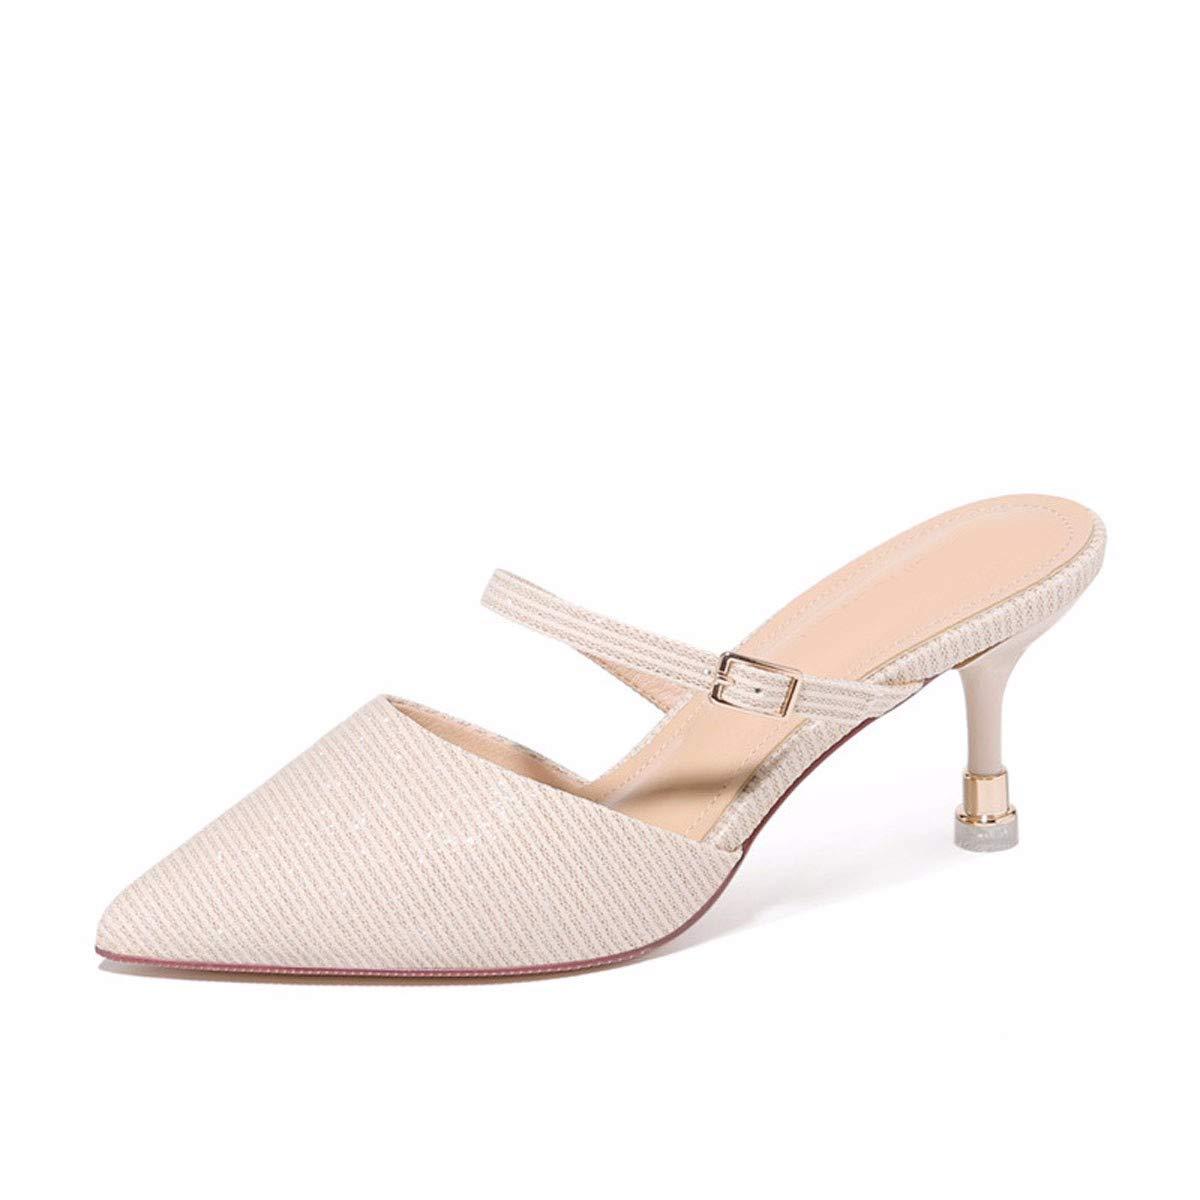 GTVERNH Scarpe da Donna Spesso Il Fondo Forte Pantofole Baotou Semi-Le Pantofole Summer Moda Indossare oroen 36